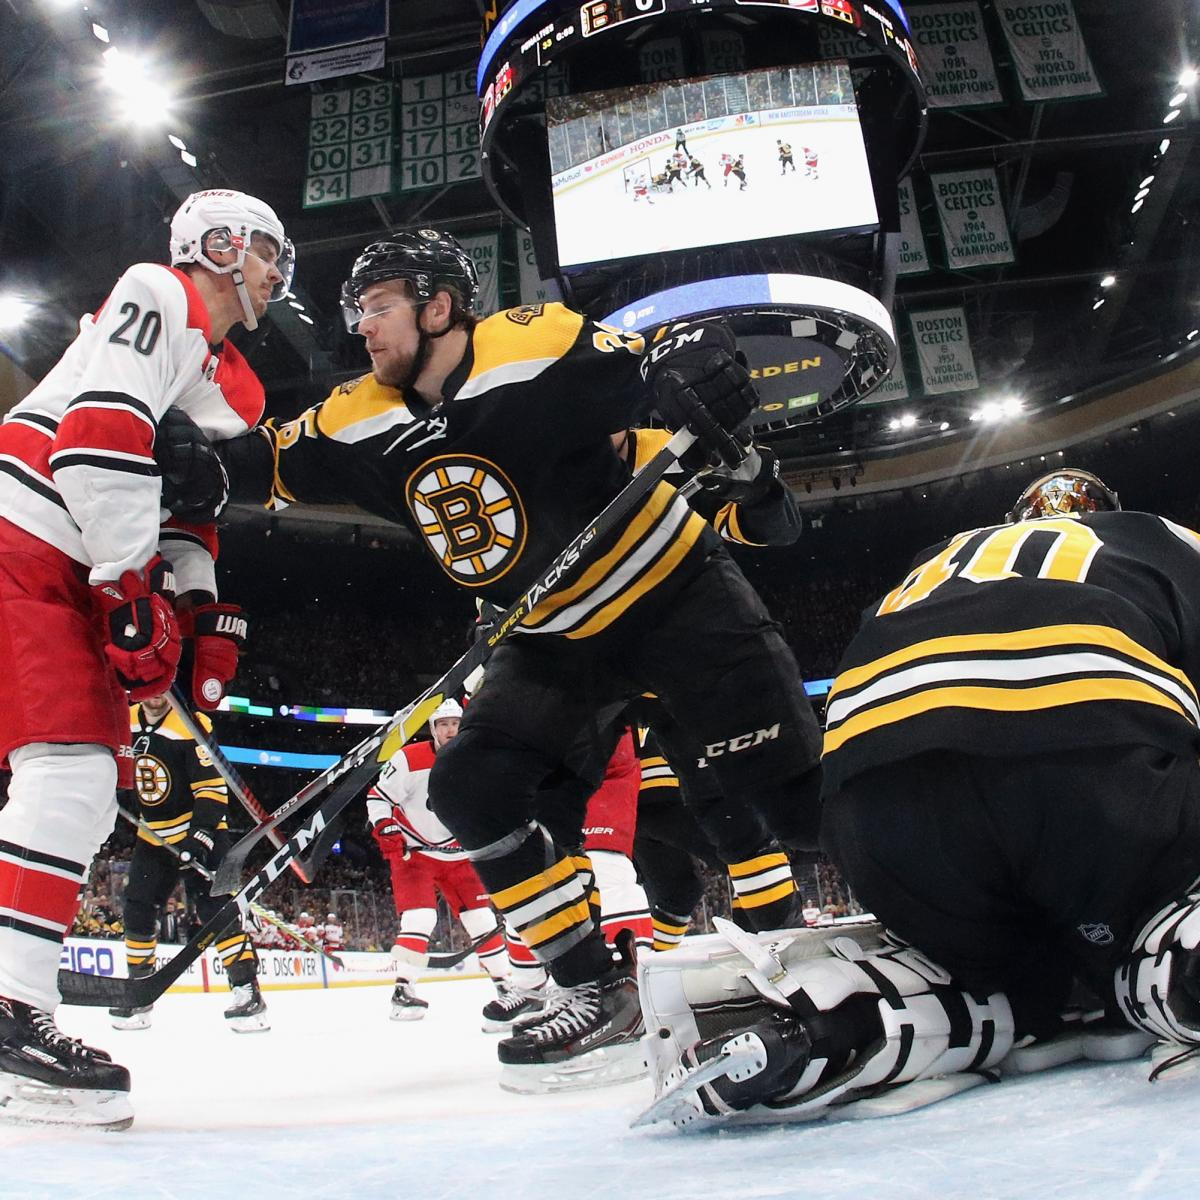 NHL Playoff Bracket 2019: Updated Dates, TV Schedule And